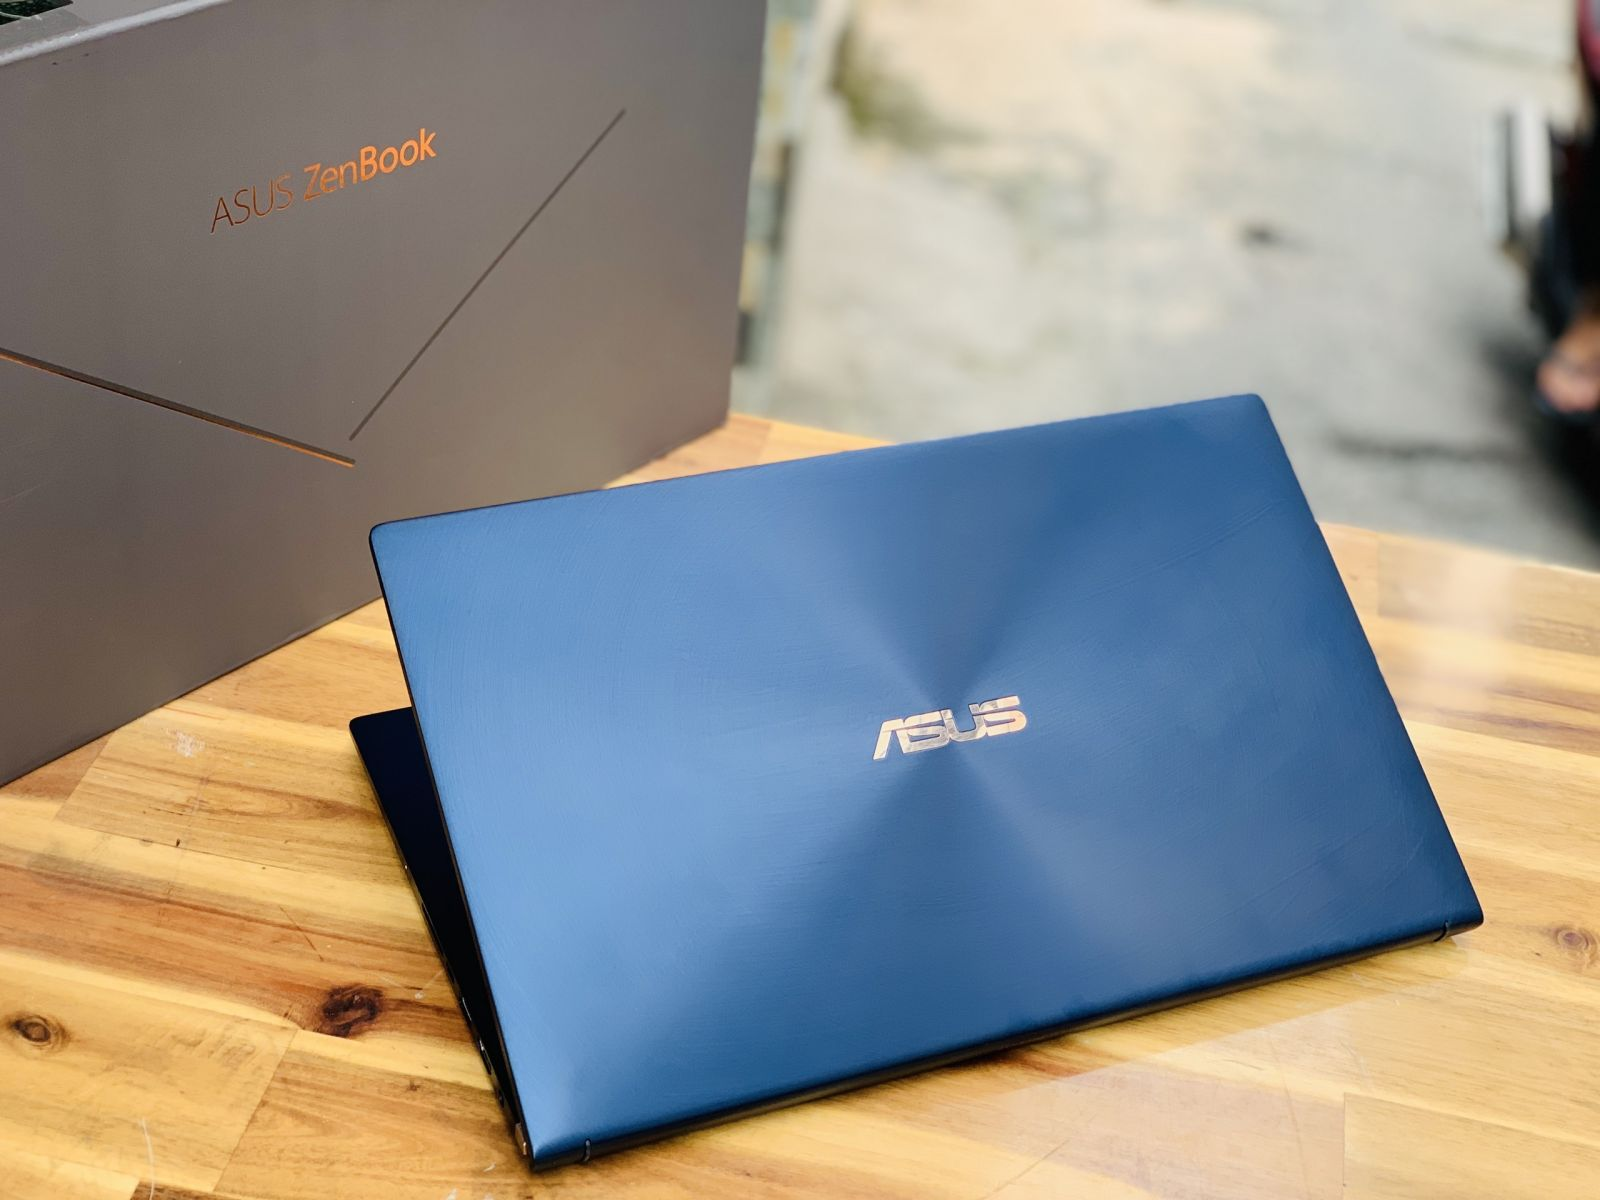 Laptop Asus Zenbook UX433FA, I7 8565U 8CPUS 8G SSD512 Full HD FaceID L - 2